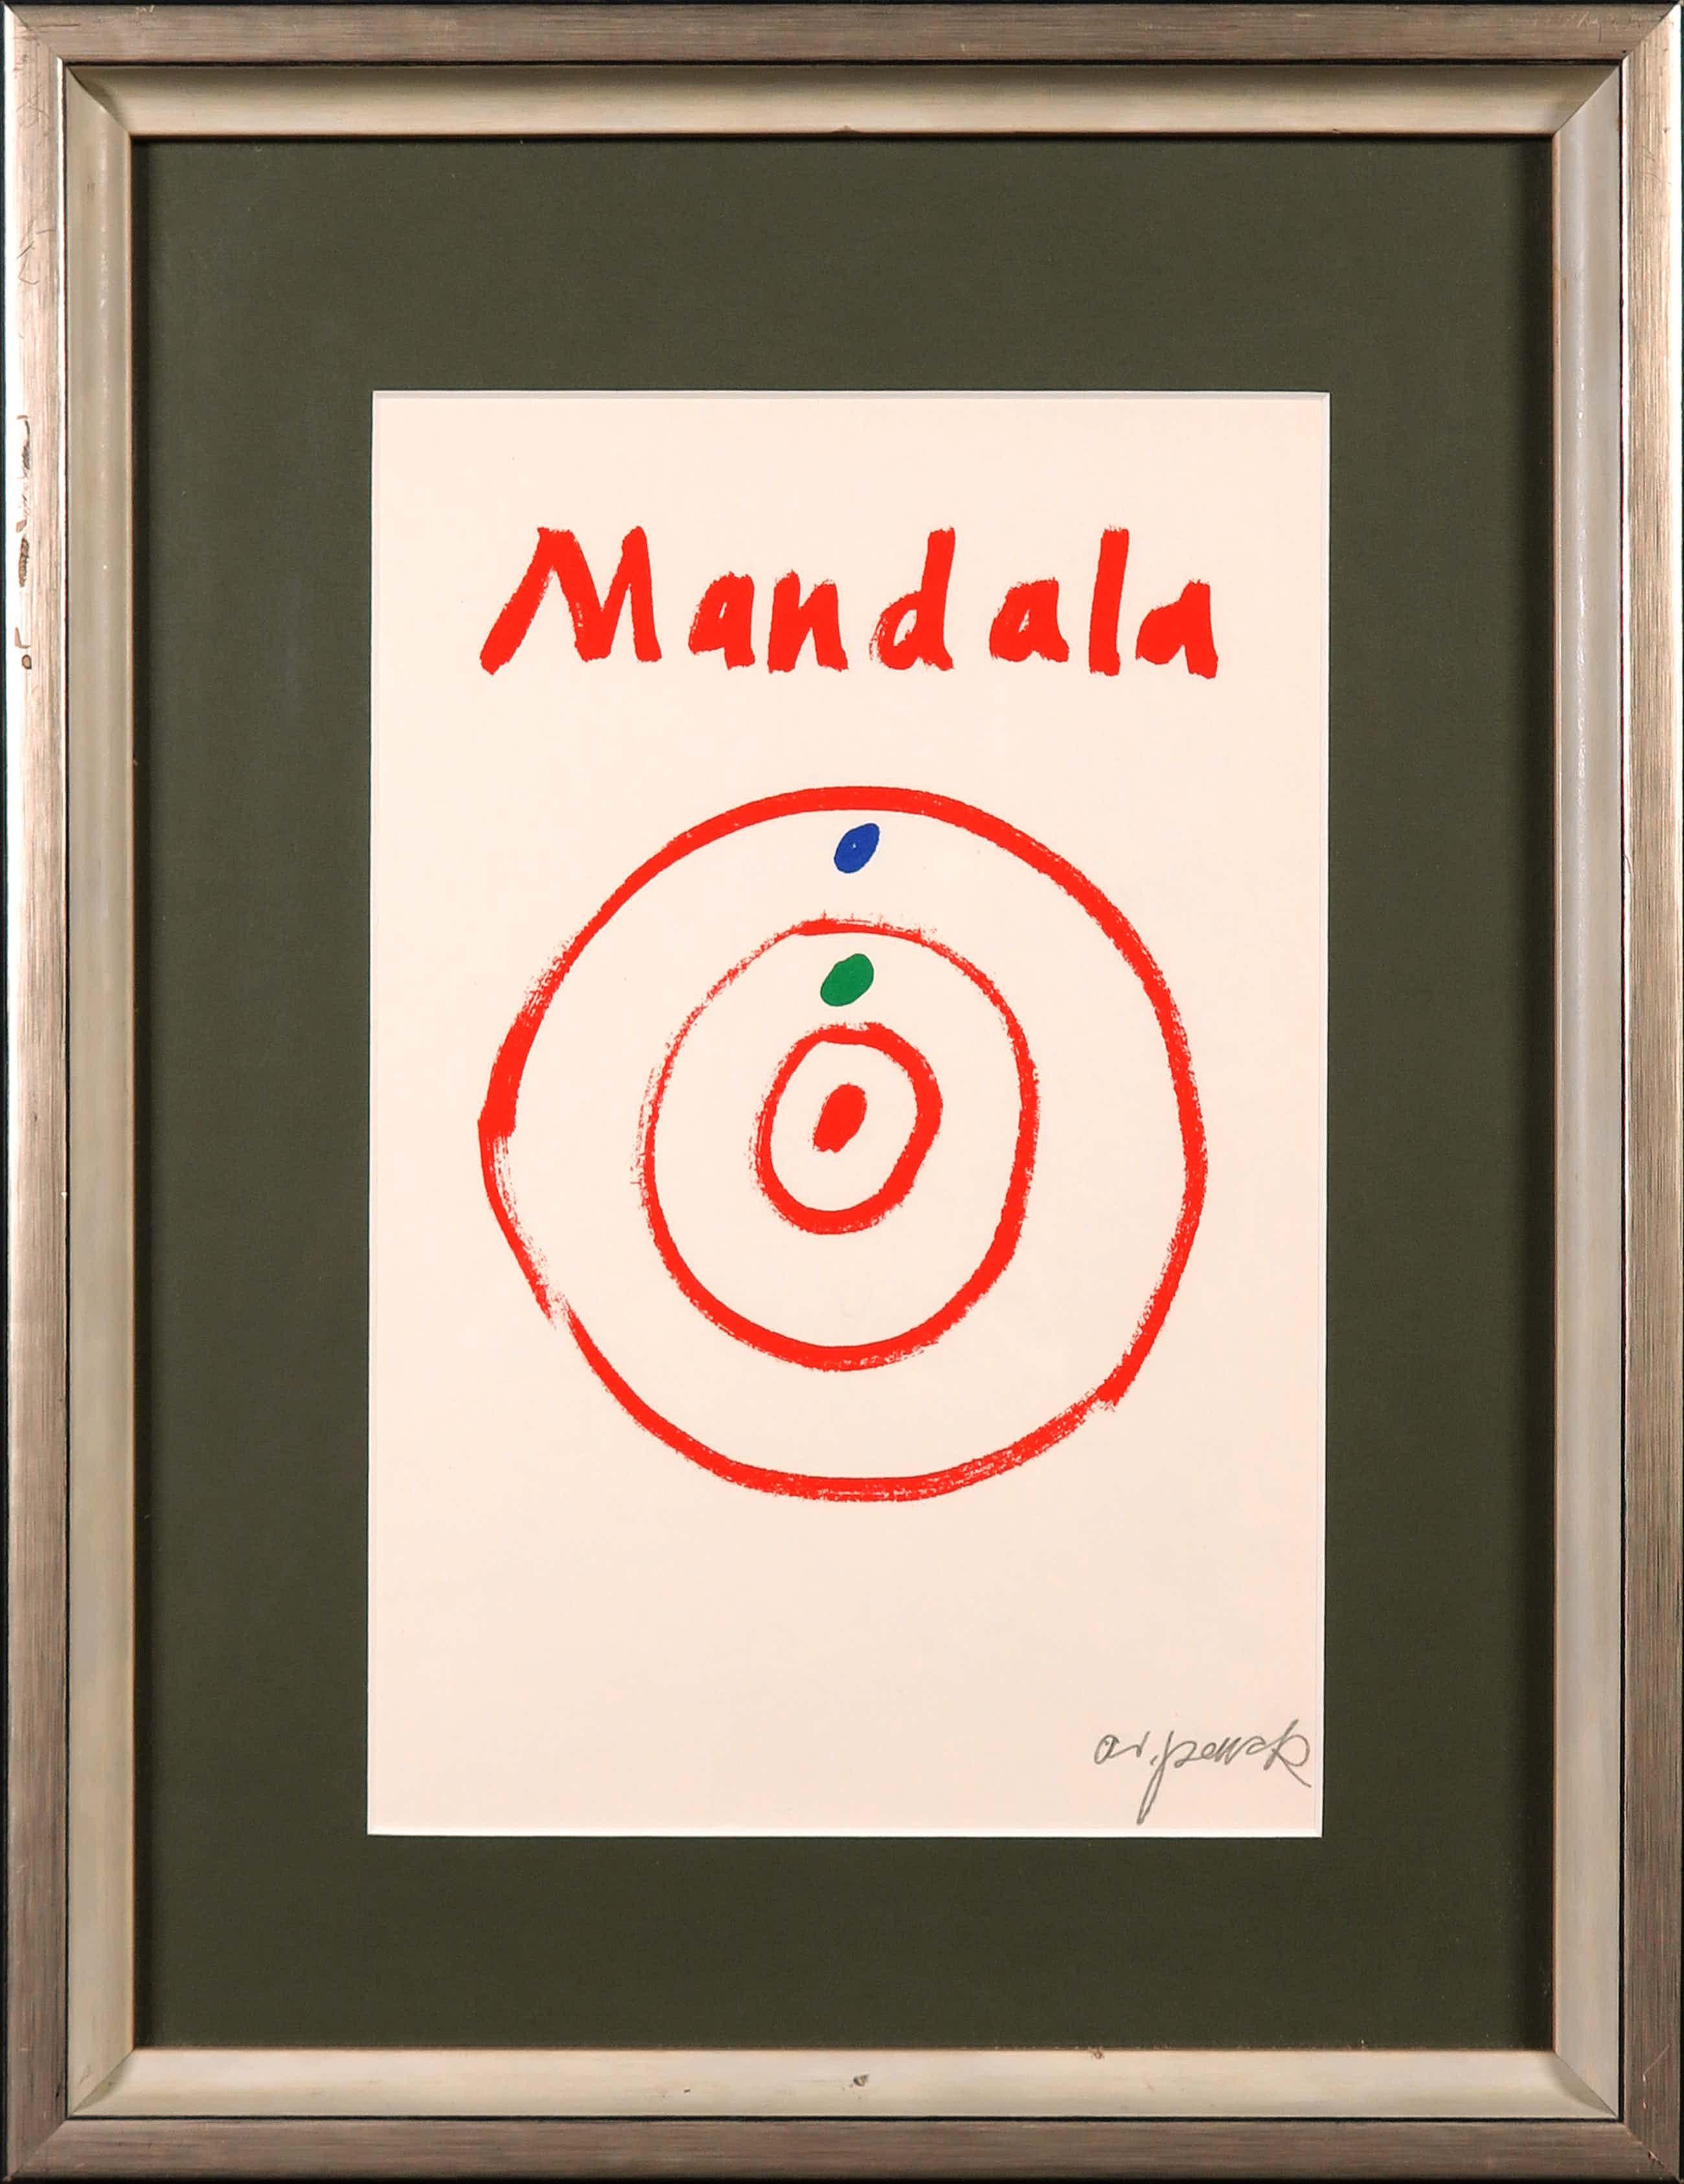 A.R. Penck - Zeldzame, handgesigneerde litho, Mandala kopen? Bied vanaf 130!